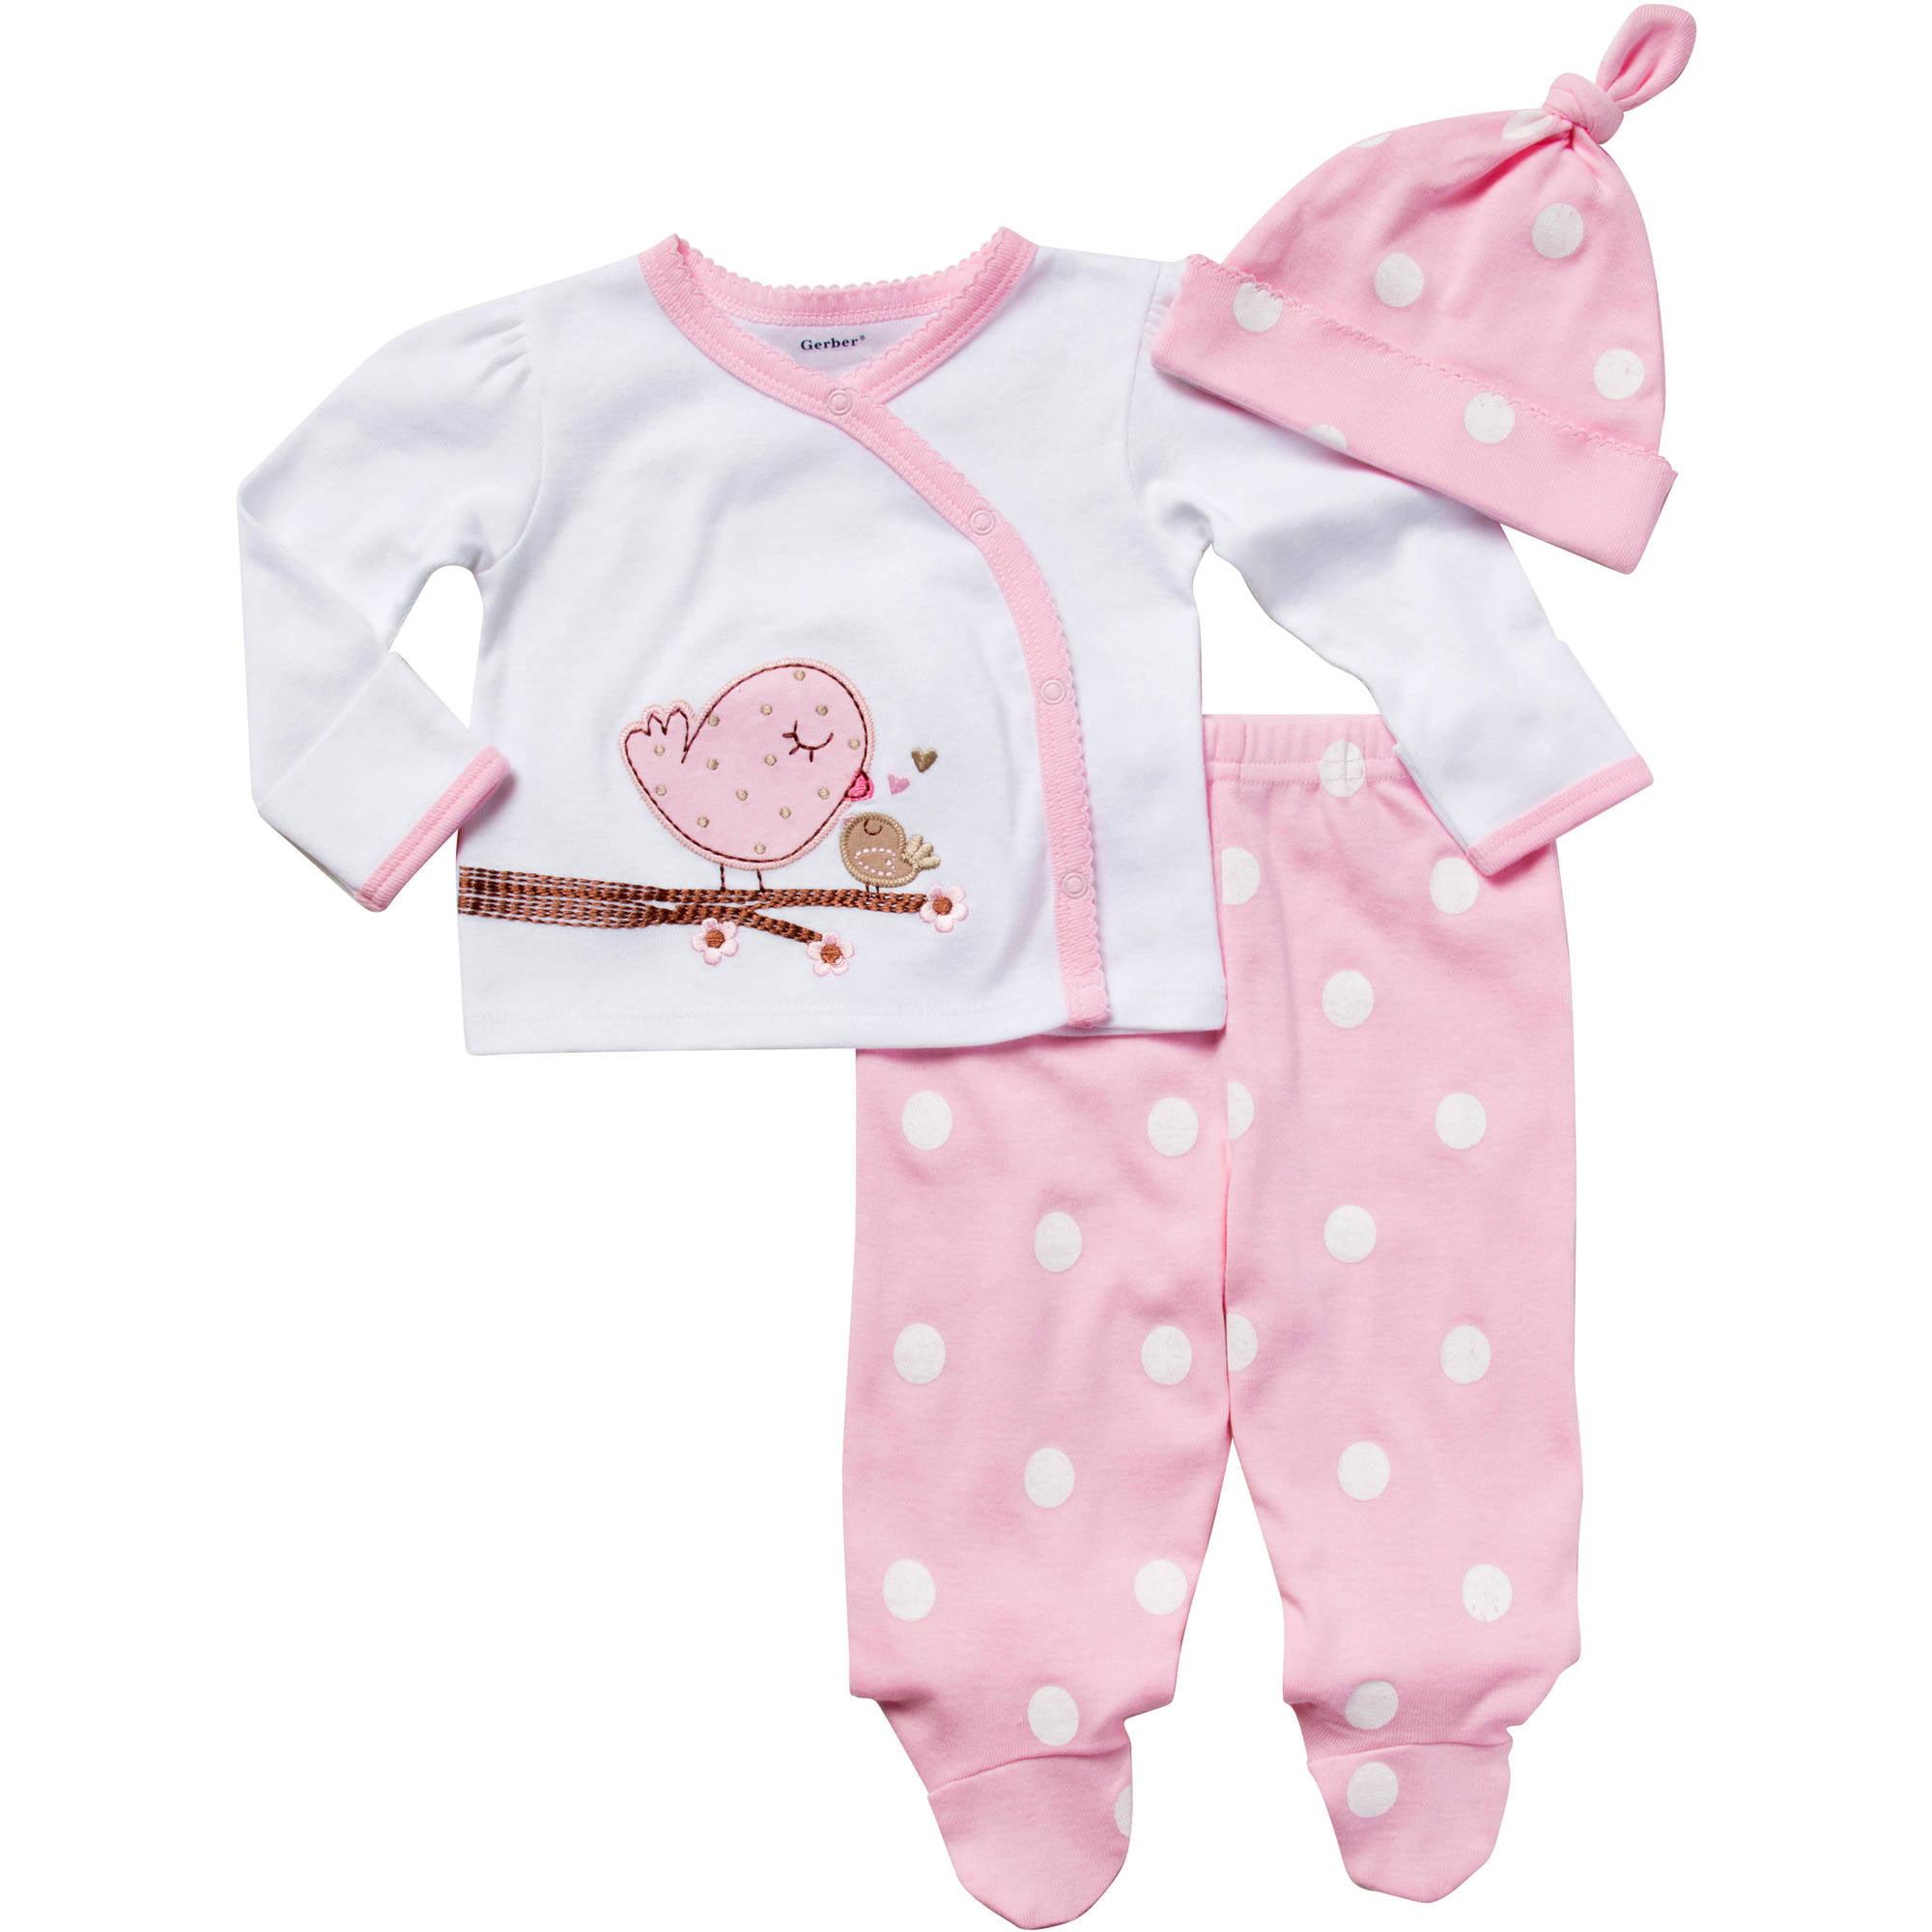 Newborn Baby Crochet Pink Flower Opp 2Pc Set Walmart